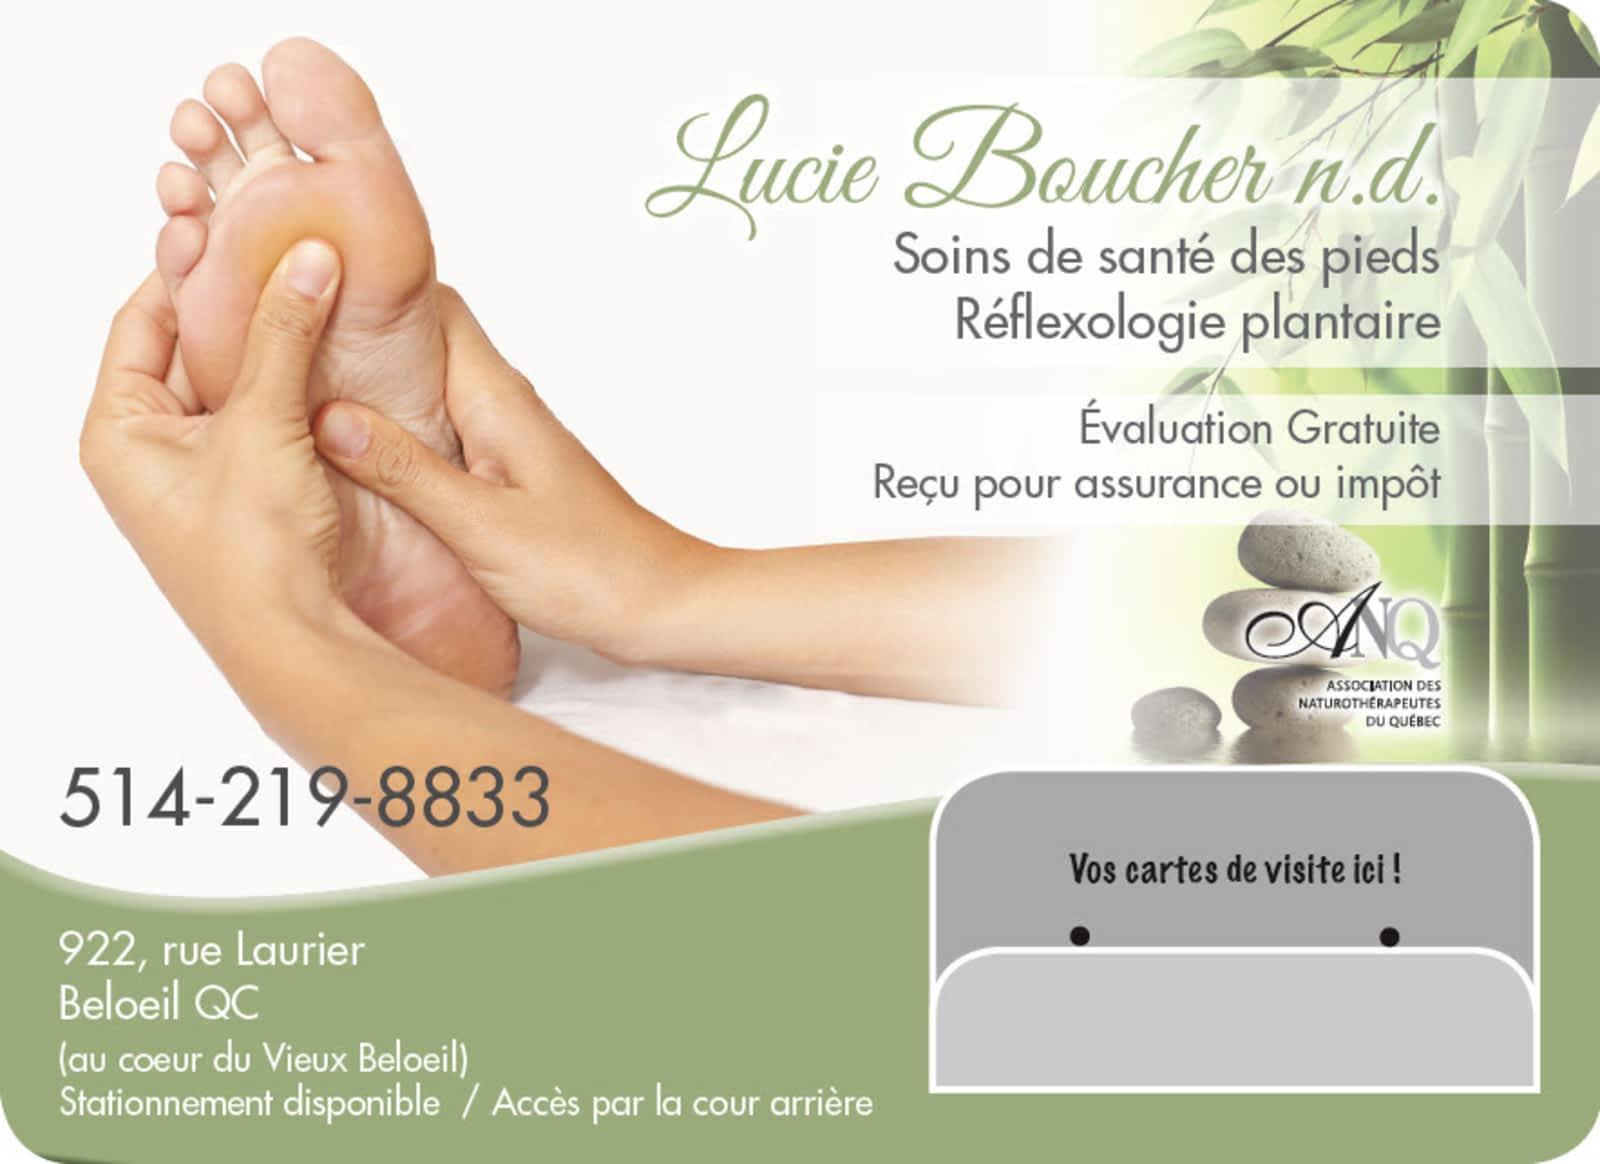 Lucie Boucher ND Soin Des Pieds Et Reflexologie Plantaire